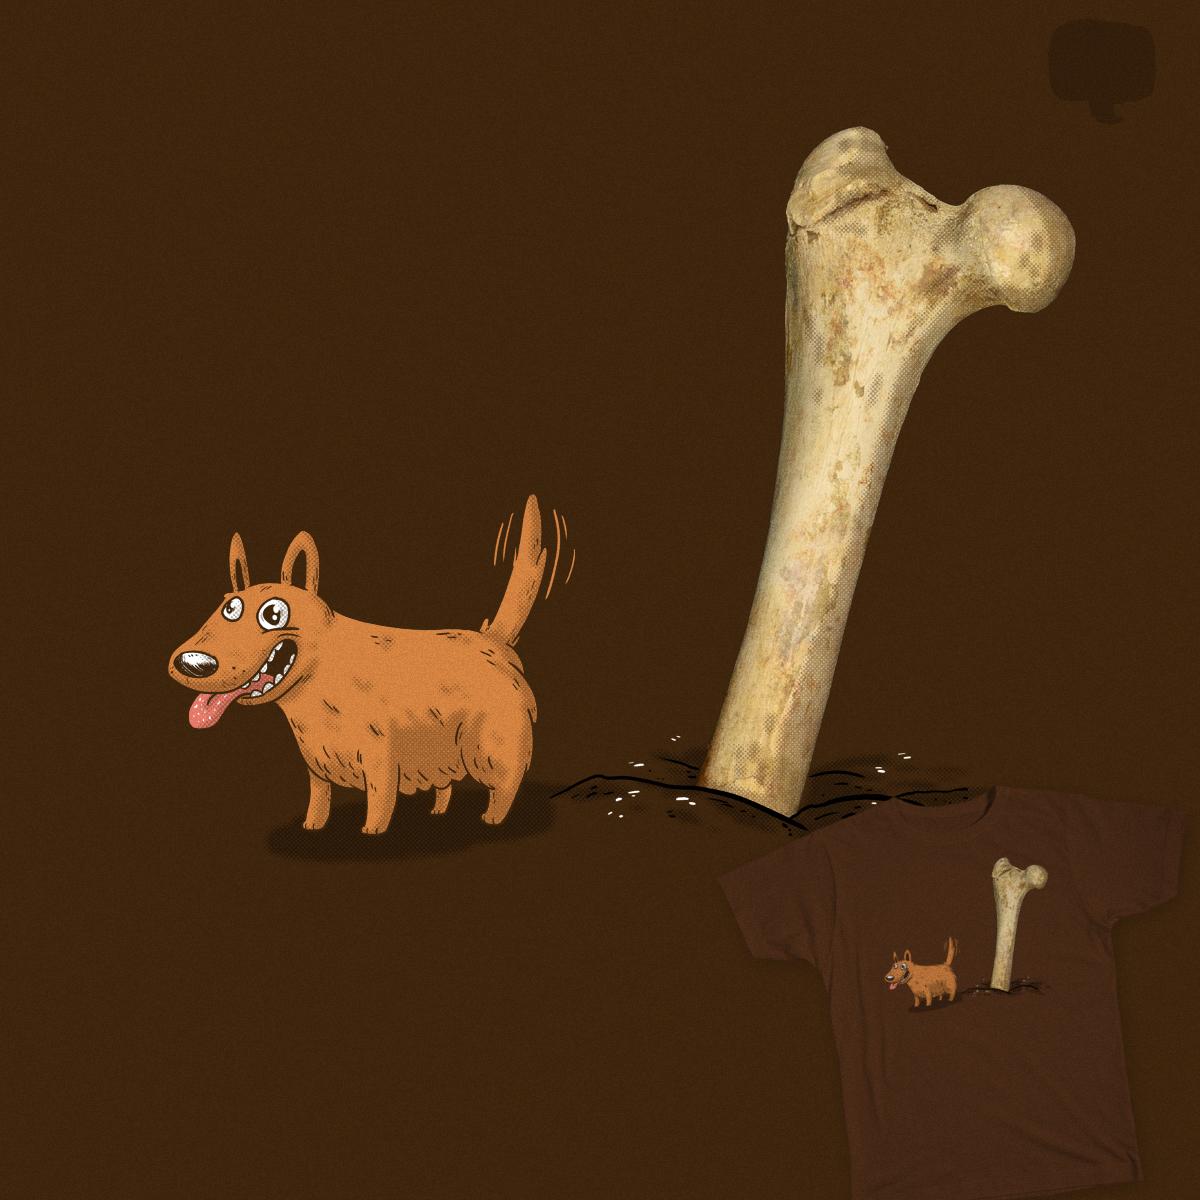 Every Dog Gets a Bone by lxromero on Threadless